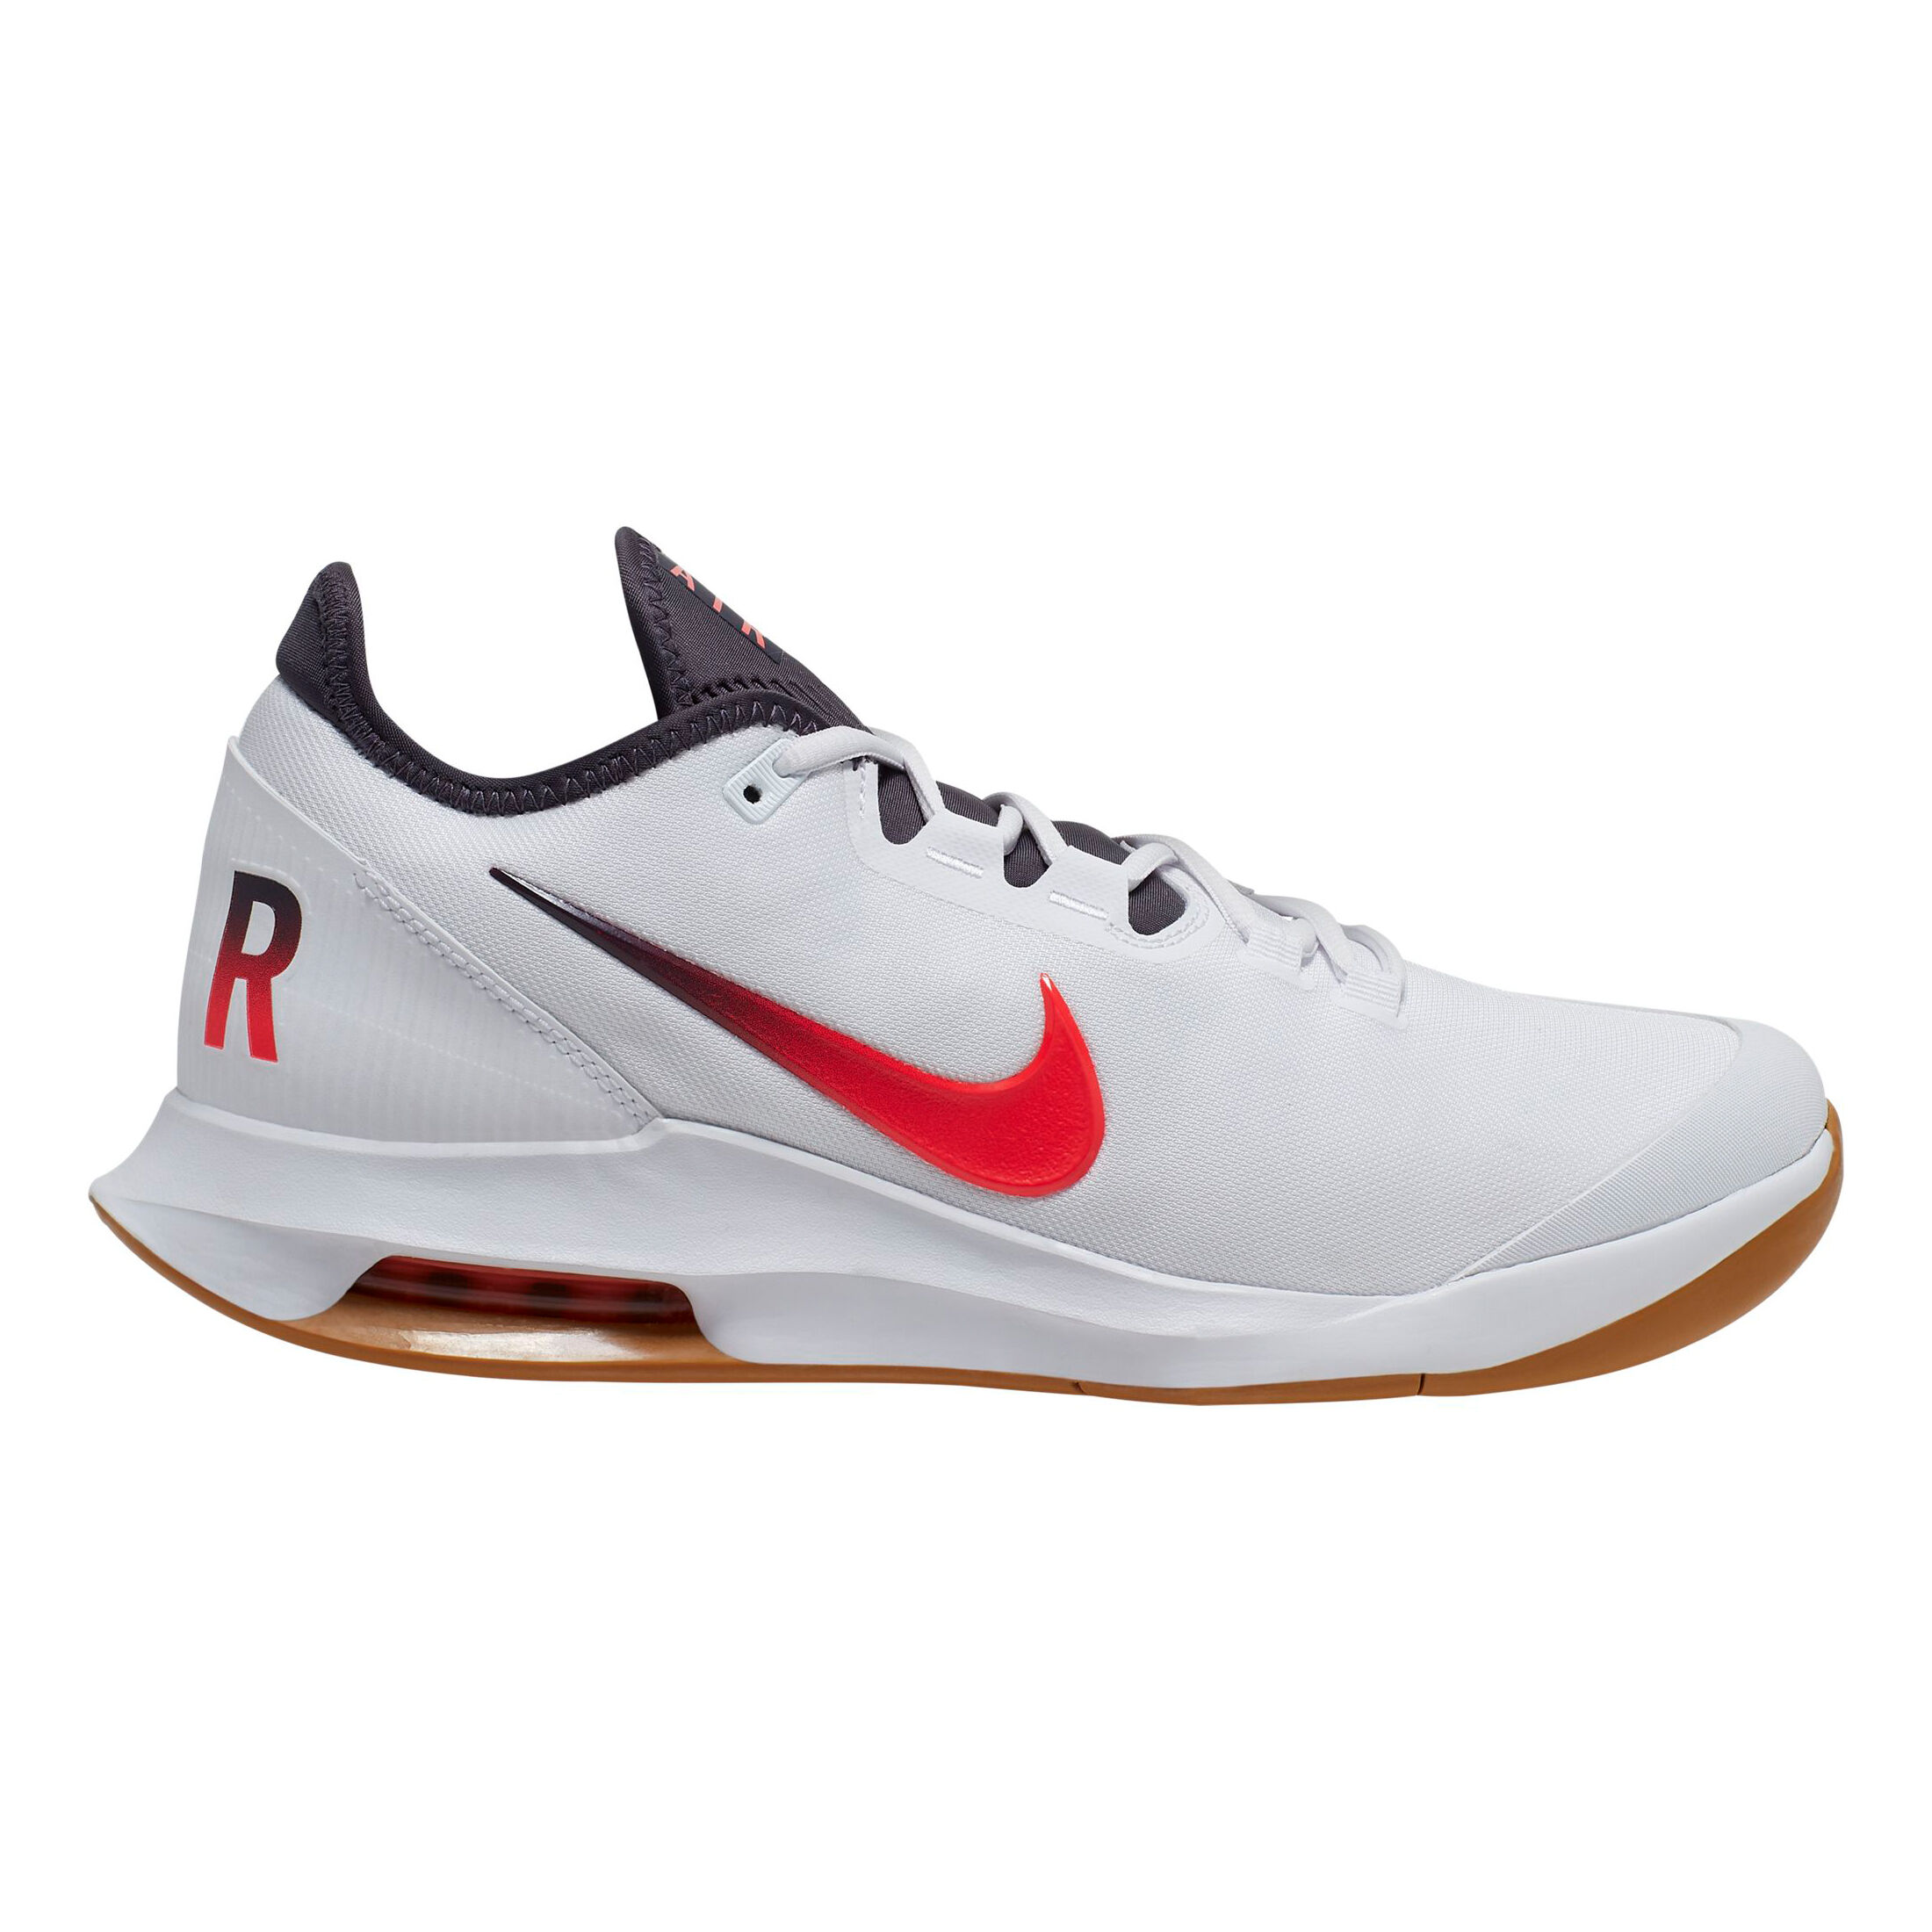 Nike Air Max sko Størrelse 33 til damer, herrer og børn